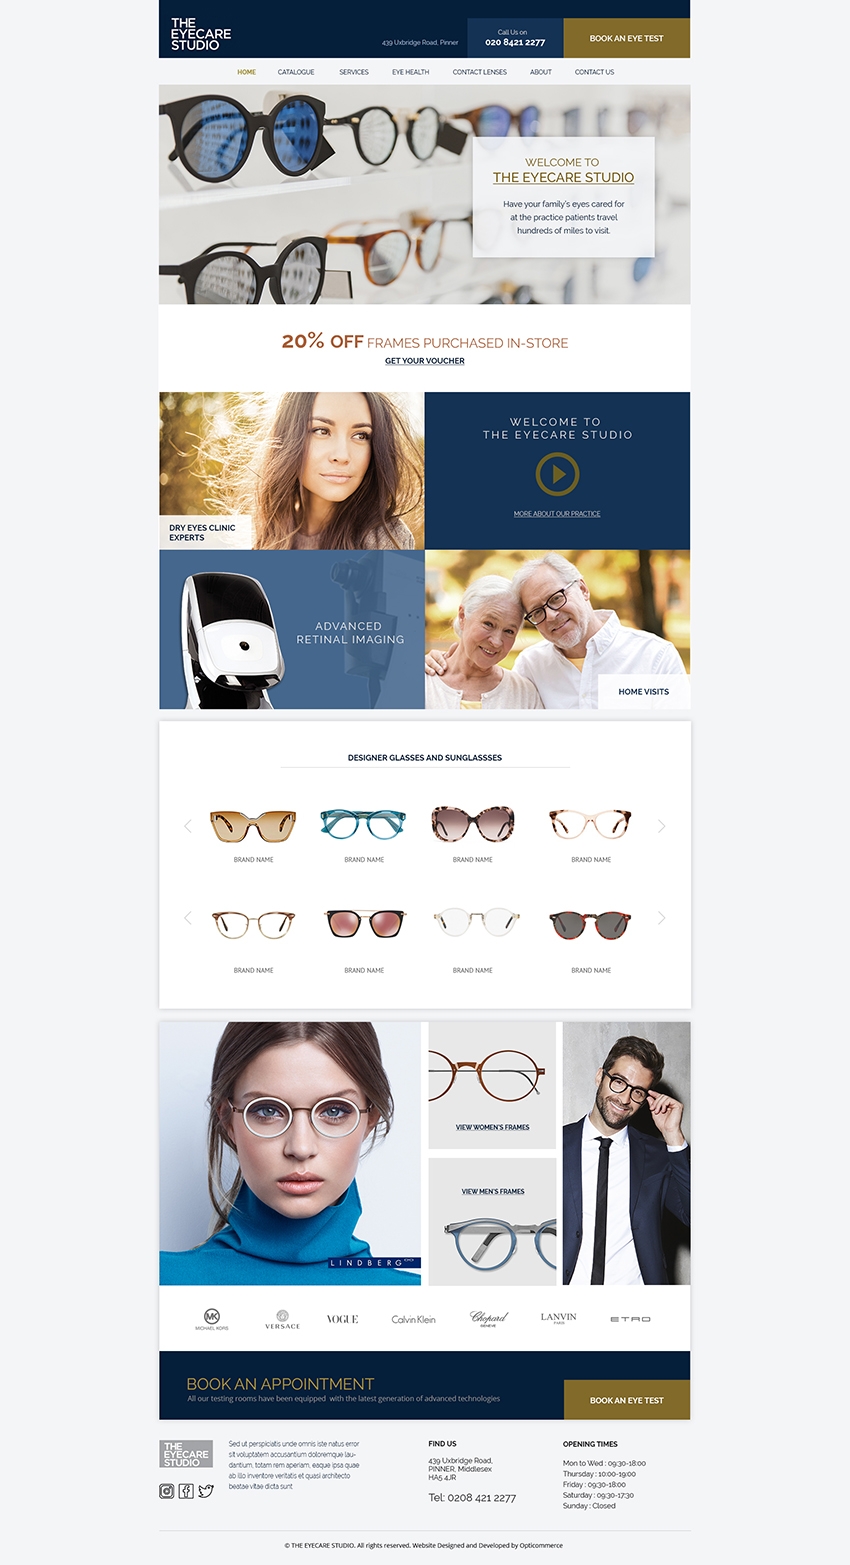 the eyecare studio website homepage